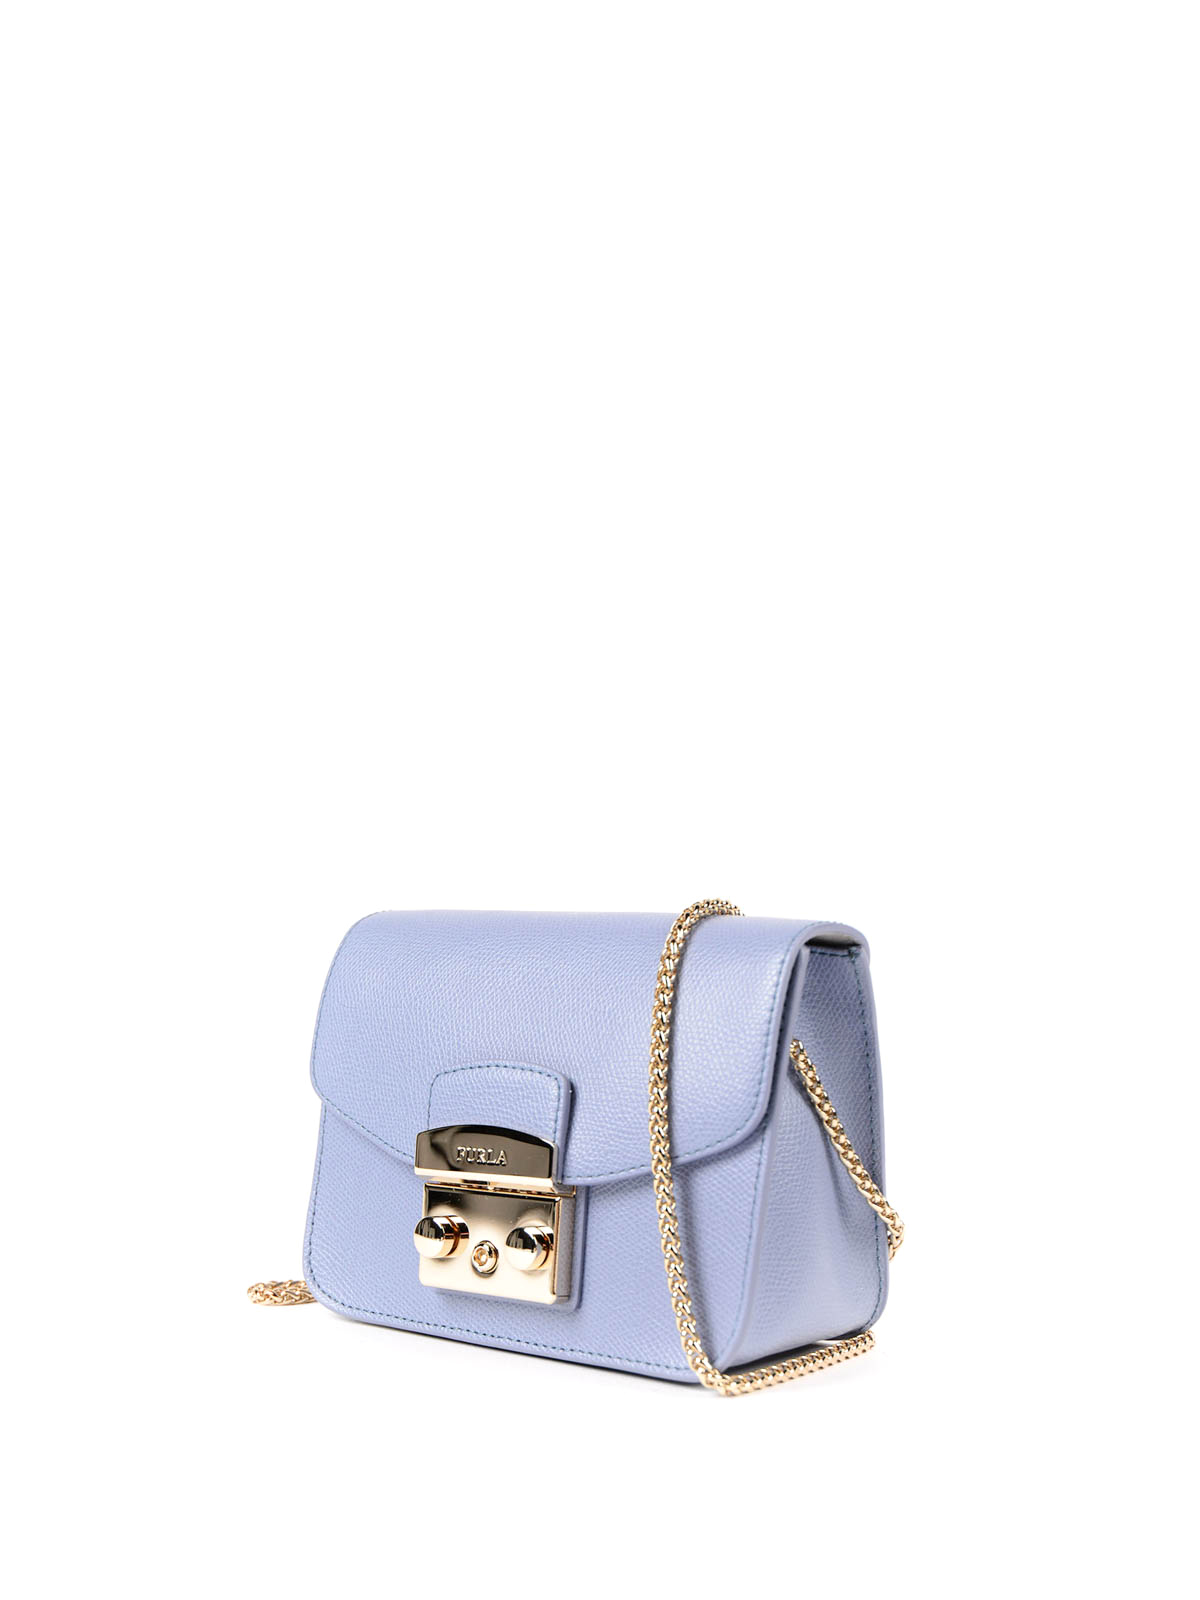 af87cc255b10 Furla - Metropolis leather mini bag - cross body bags - 908213 ...